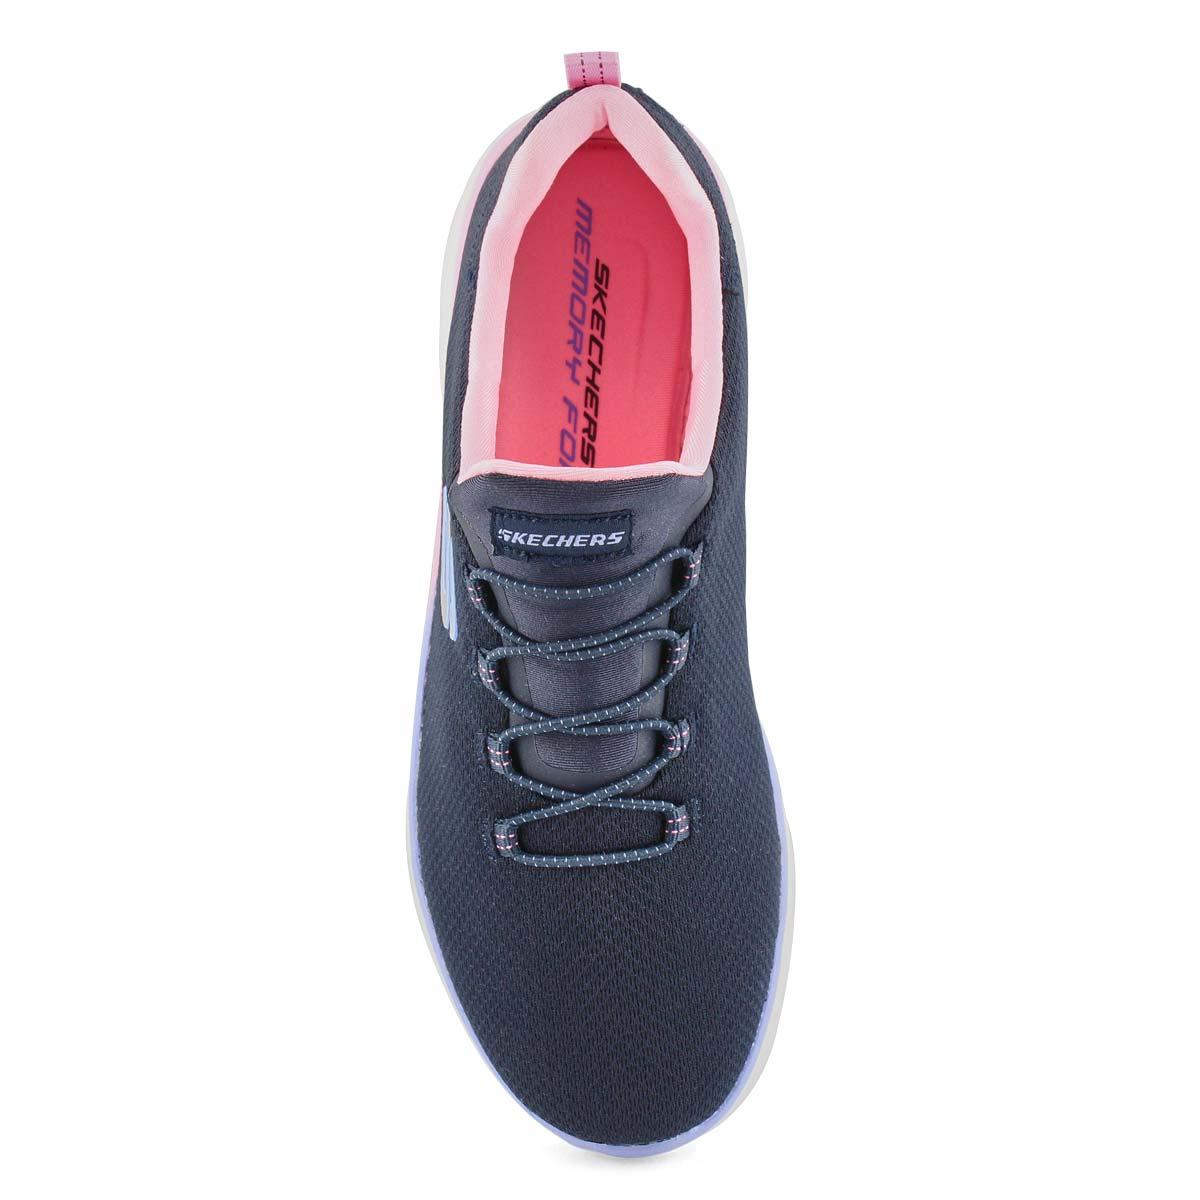 Lds Summits nvy/pnk slip on sneaker